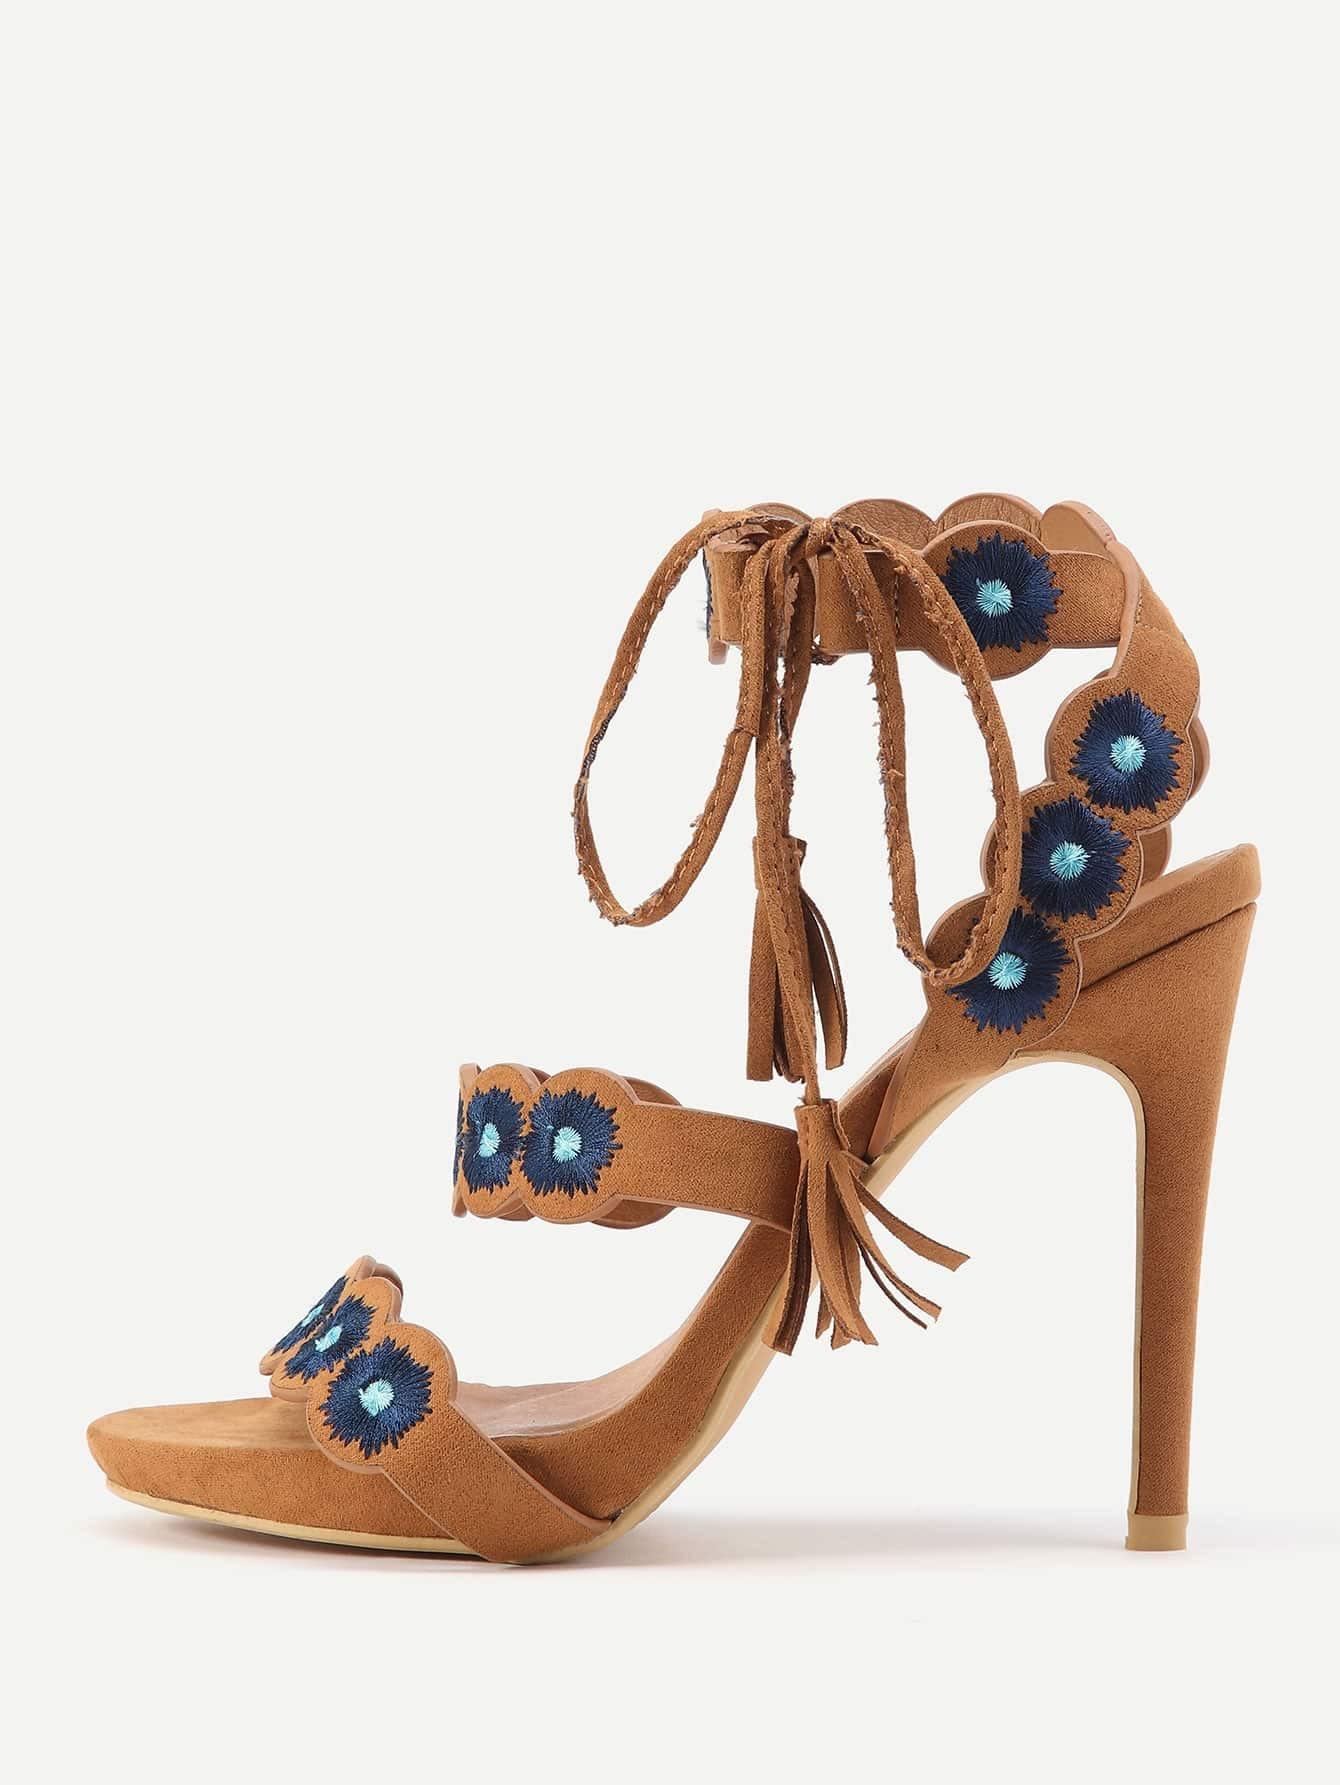 Фото Peep Toe Embroidery High Heeled Sandals With Tassel Tie. Купить с доставкой